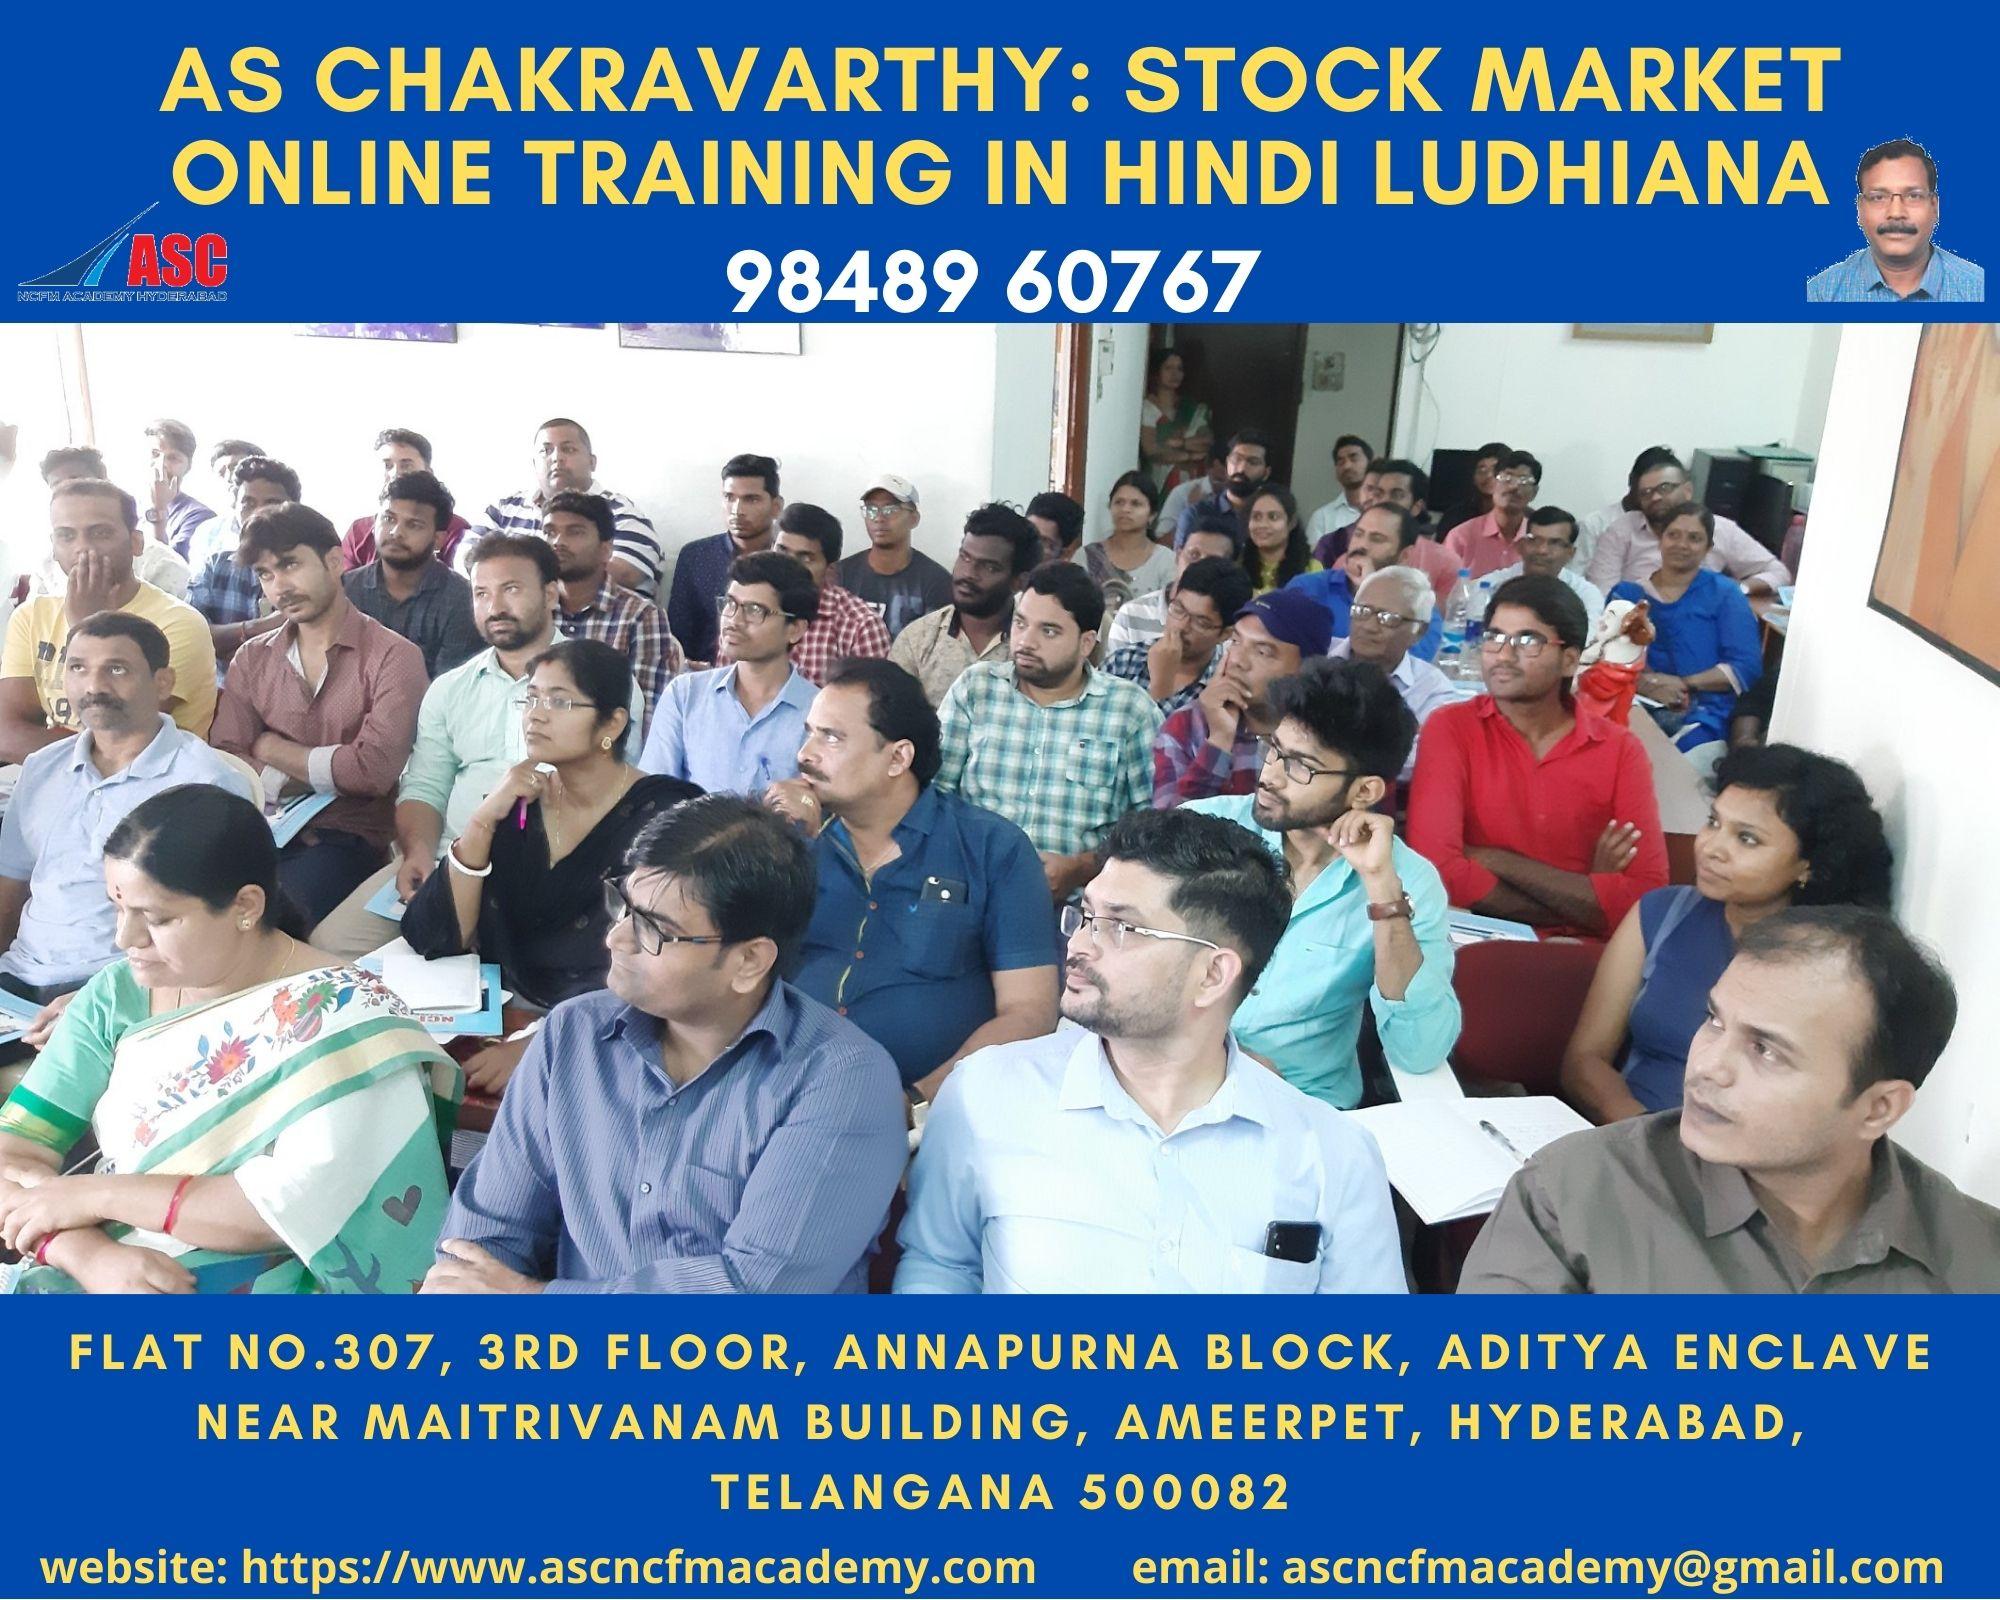 Online Stock Market Technical Training in Hindi Ludhiana